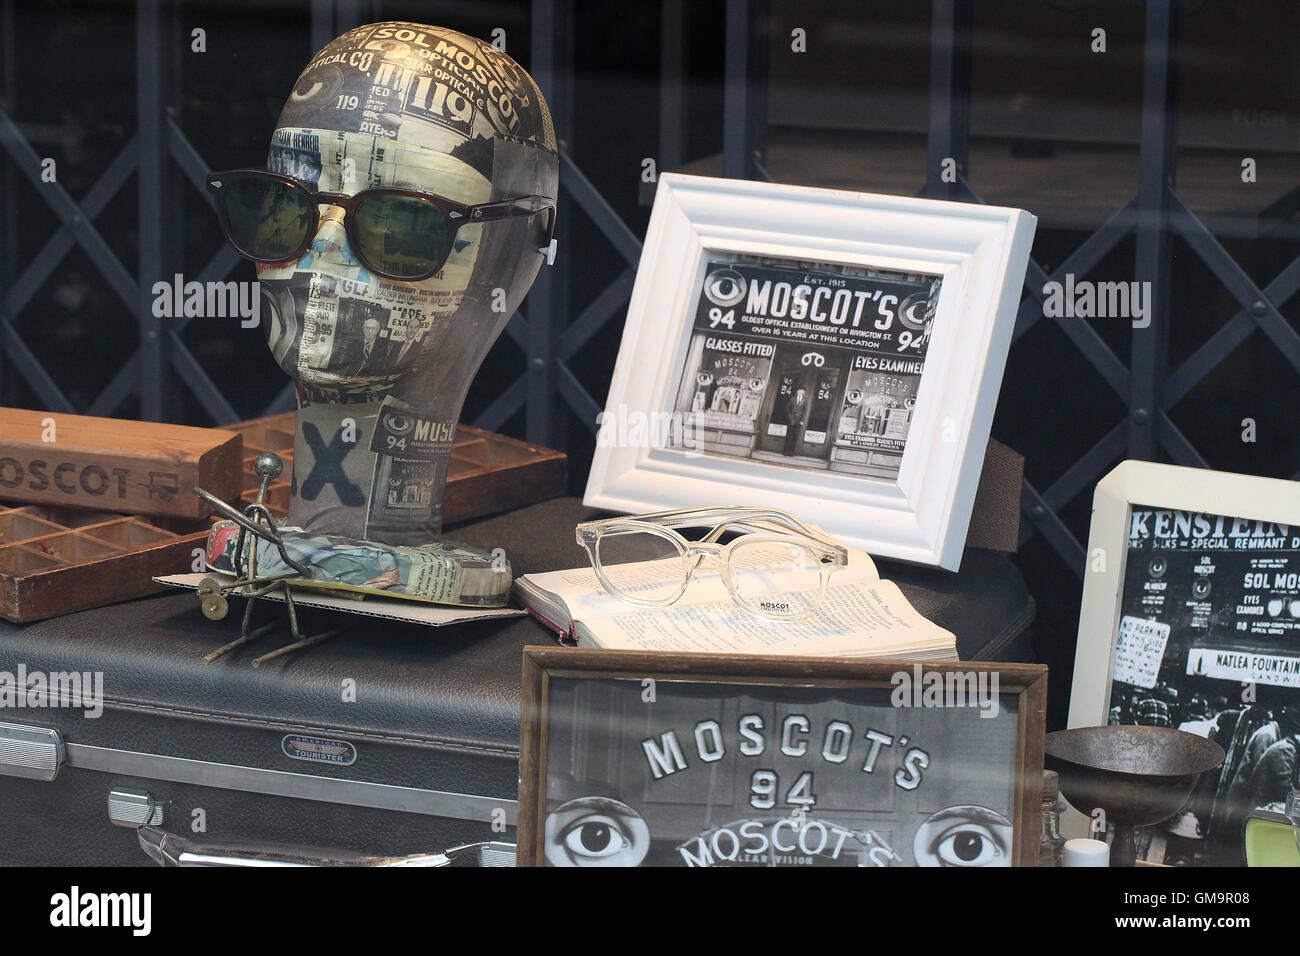 Moscots Eyewear Window Display - Stock Image